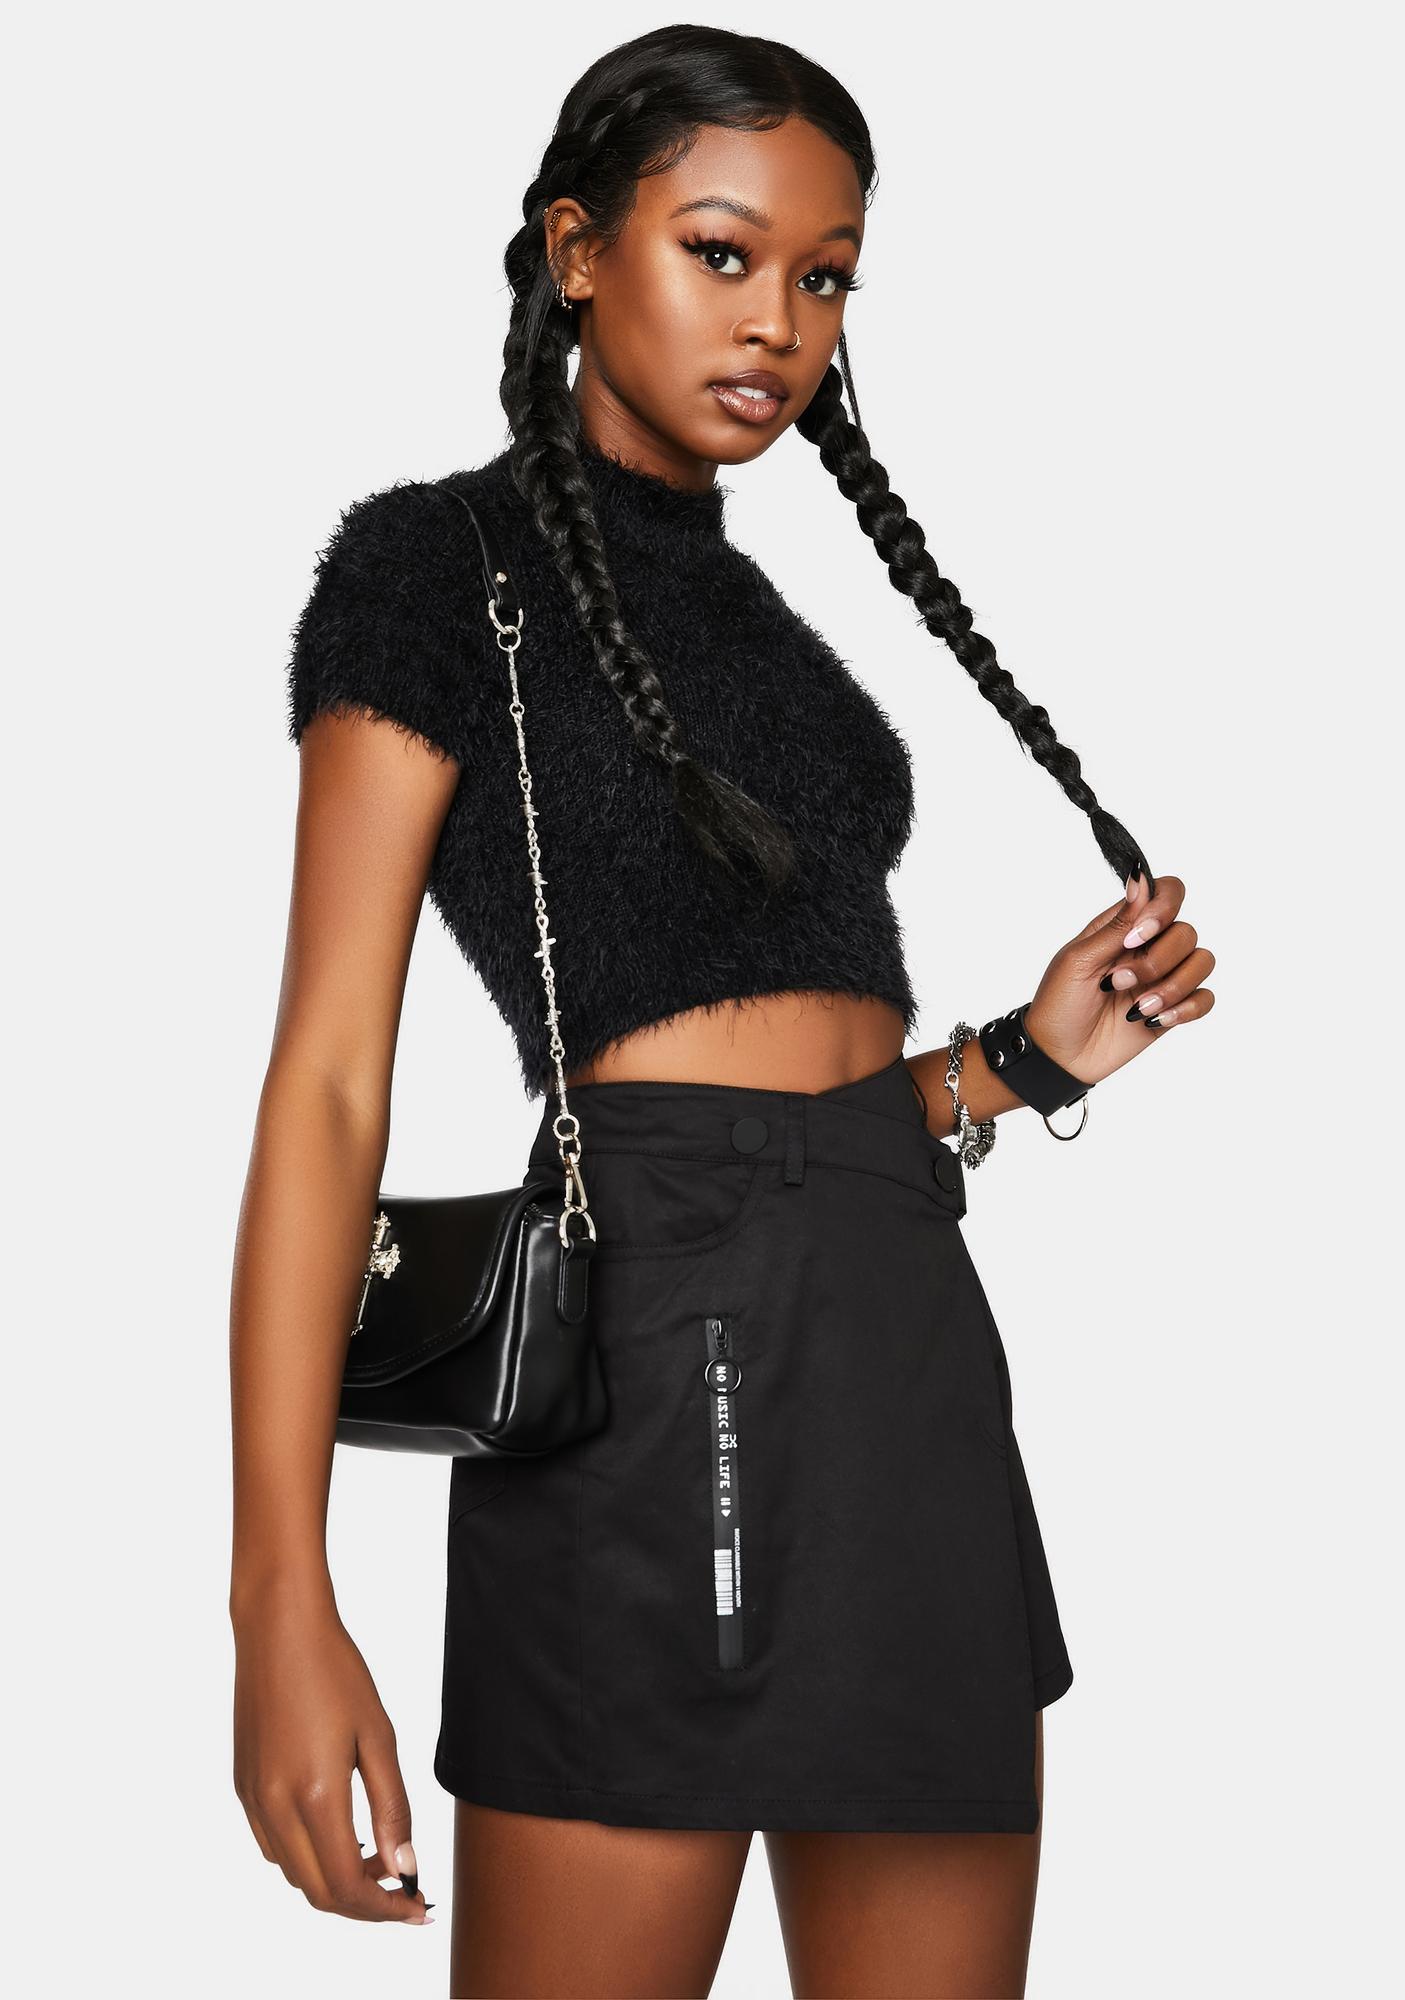 Punk Rave Asymmetrical Tailored Inclined Zipper Skirt